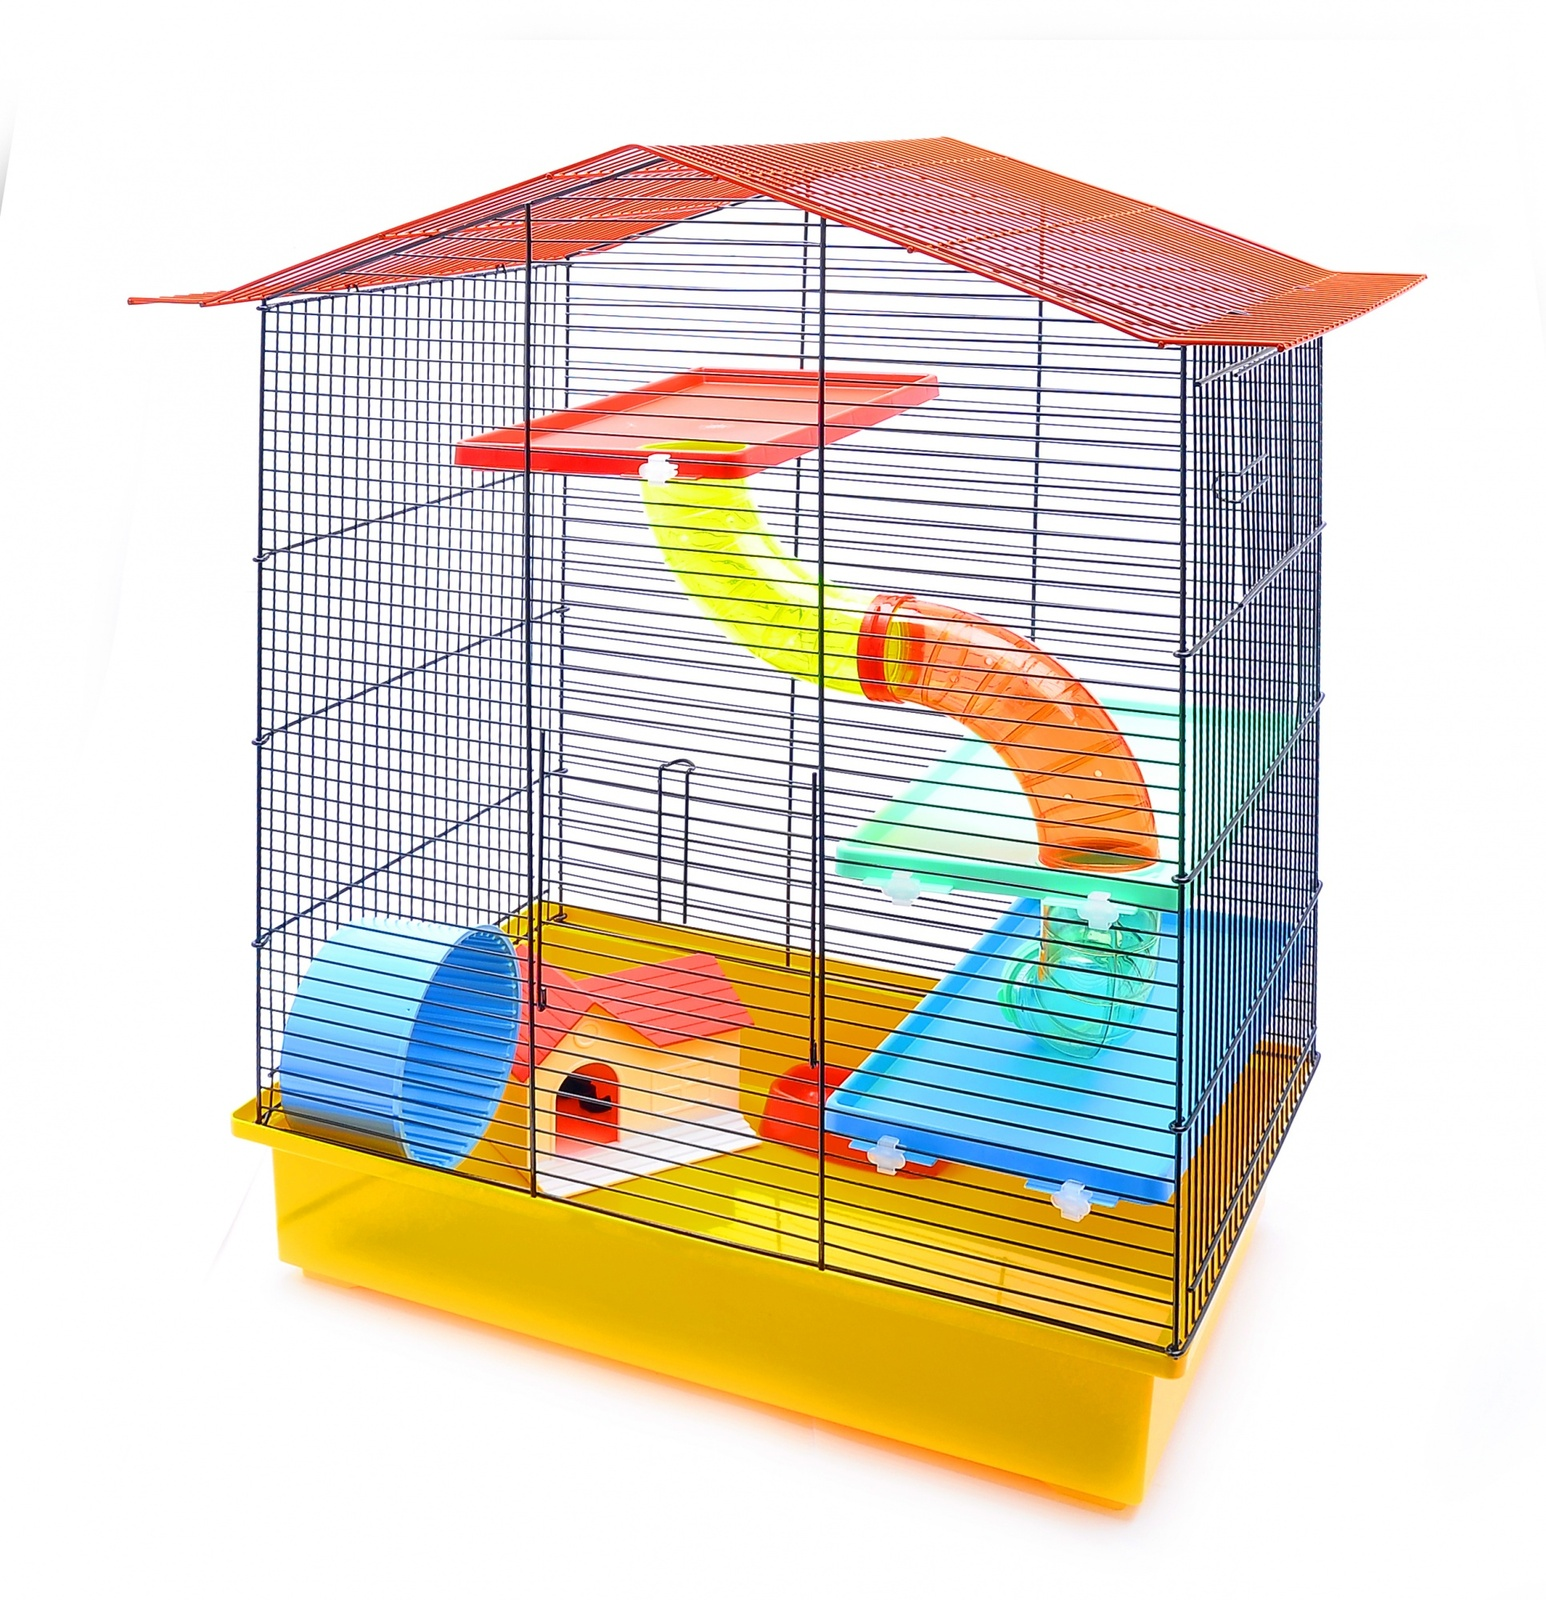 benelux Benelux Клетка для хомяков Миа 58 * 40,5 * 68 см (Cage for hamsters mia funny) 35143 31467